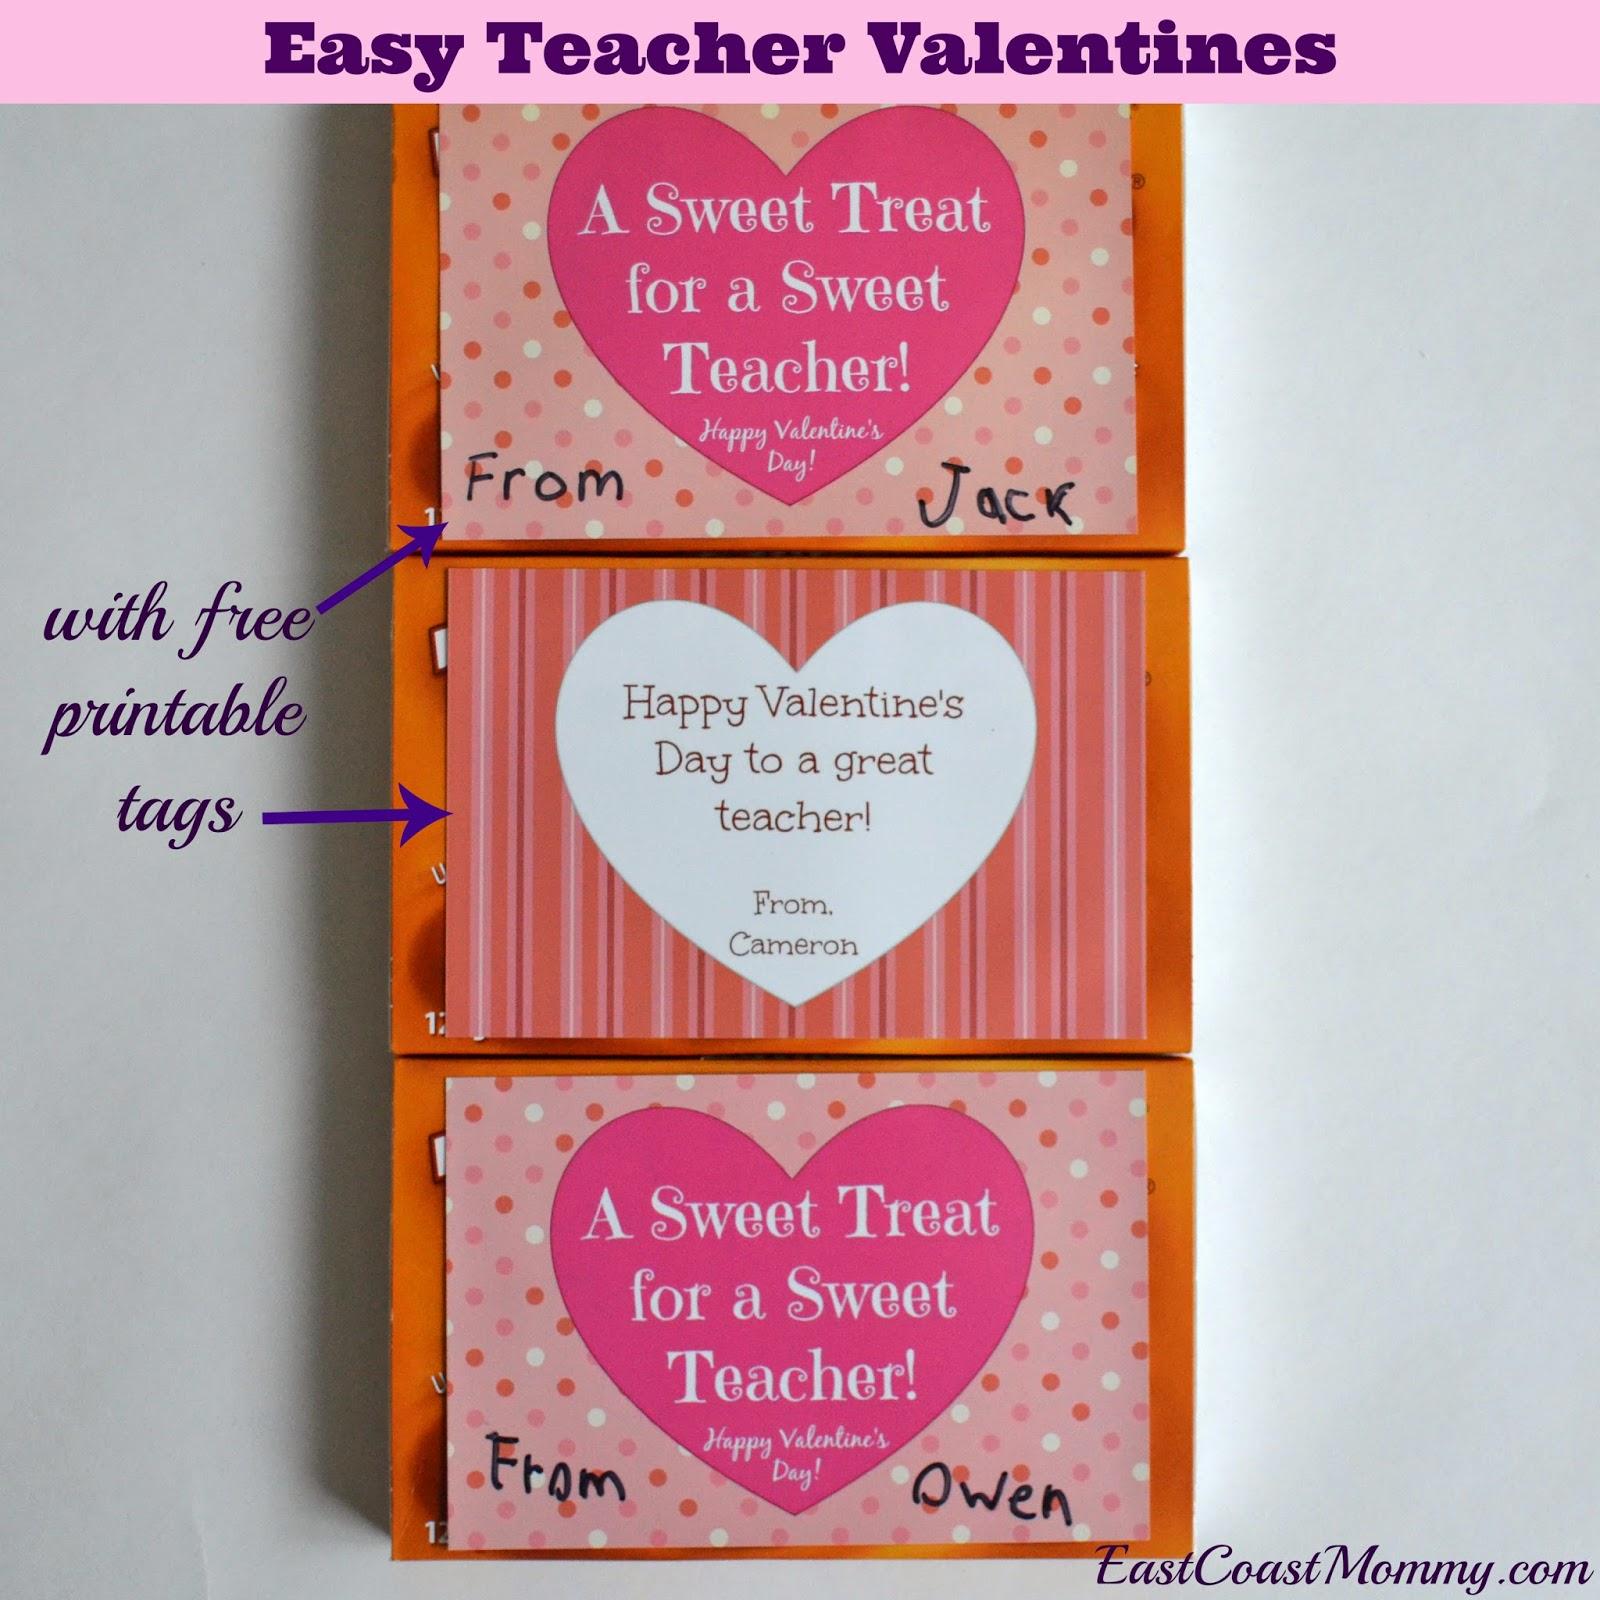 East Coast Mommy Last Minute Teacher Valentines With Free Printable Tags